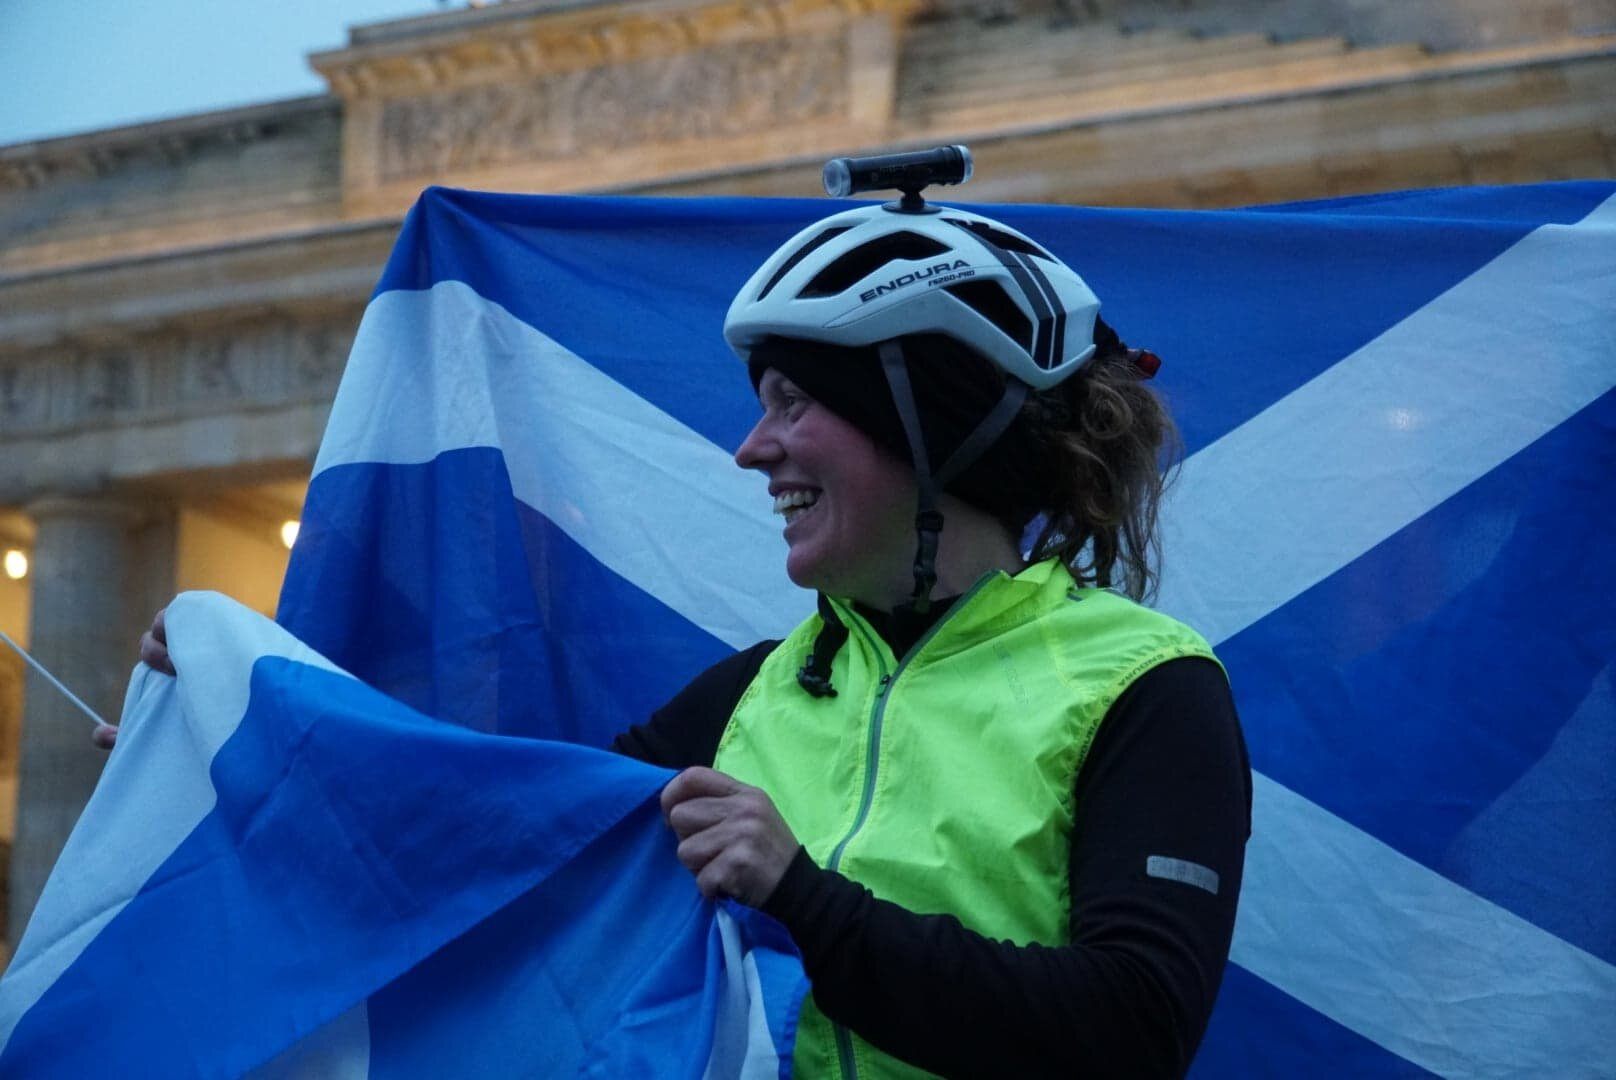 Jenny Graham at the Brandenberg Gate, Berlin - Round the World record